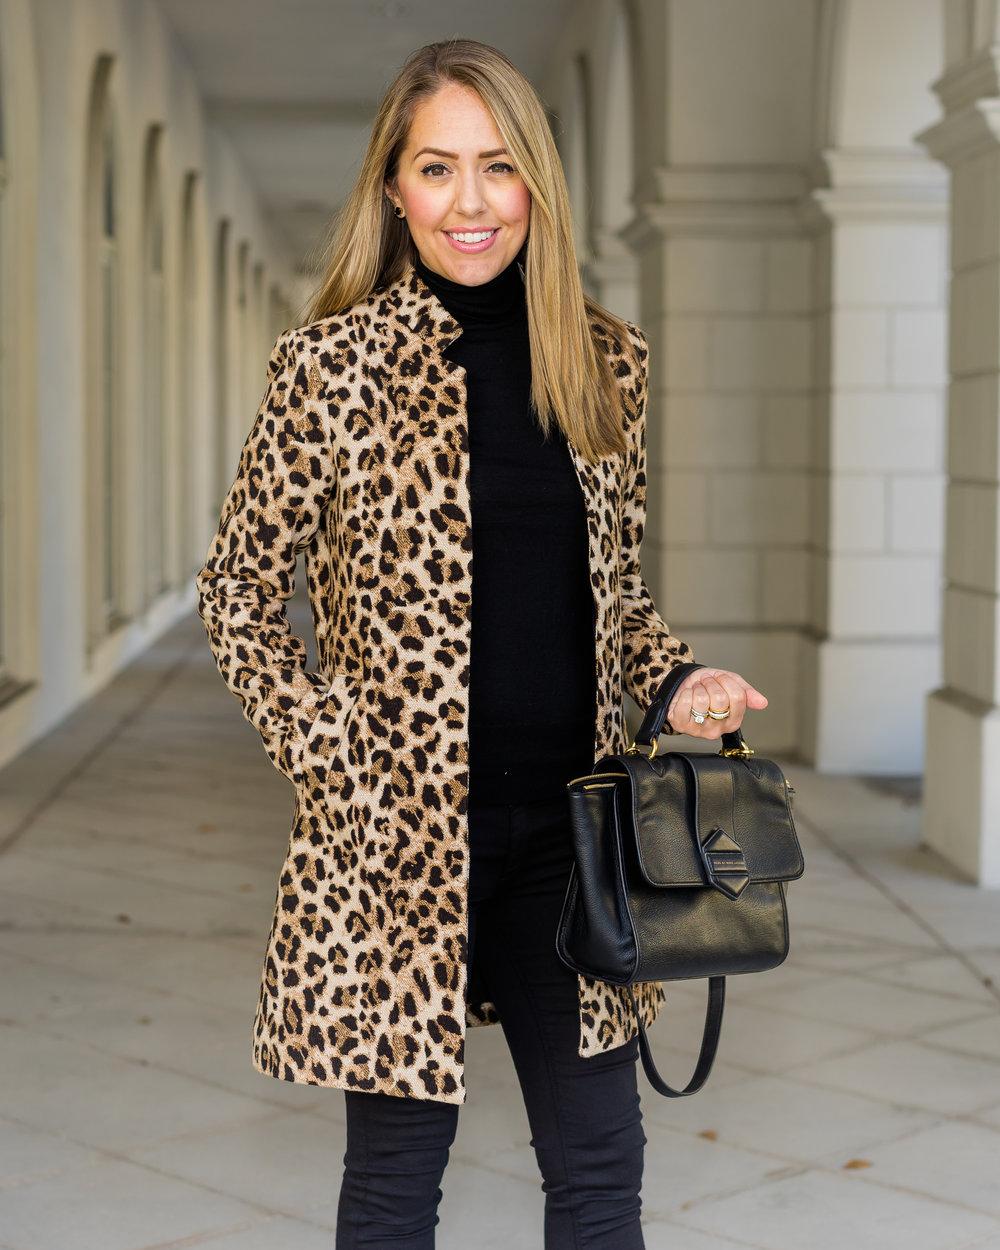 Leopard coat, black turtleneck